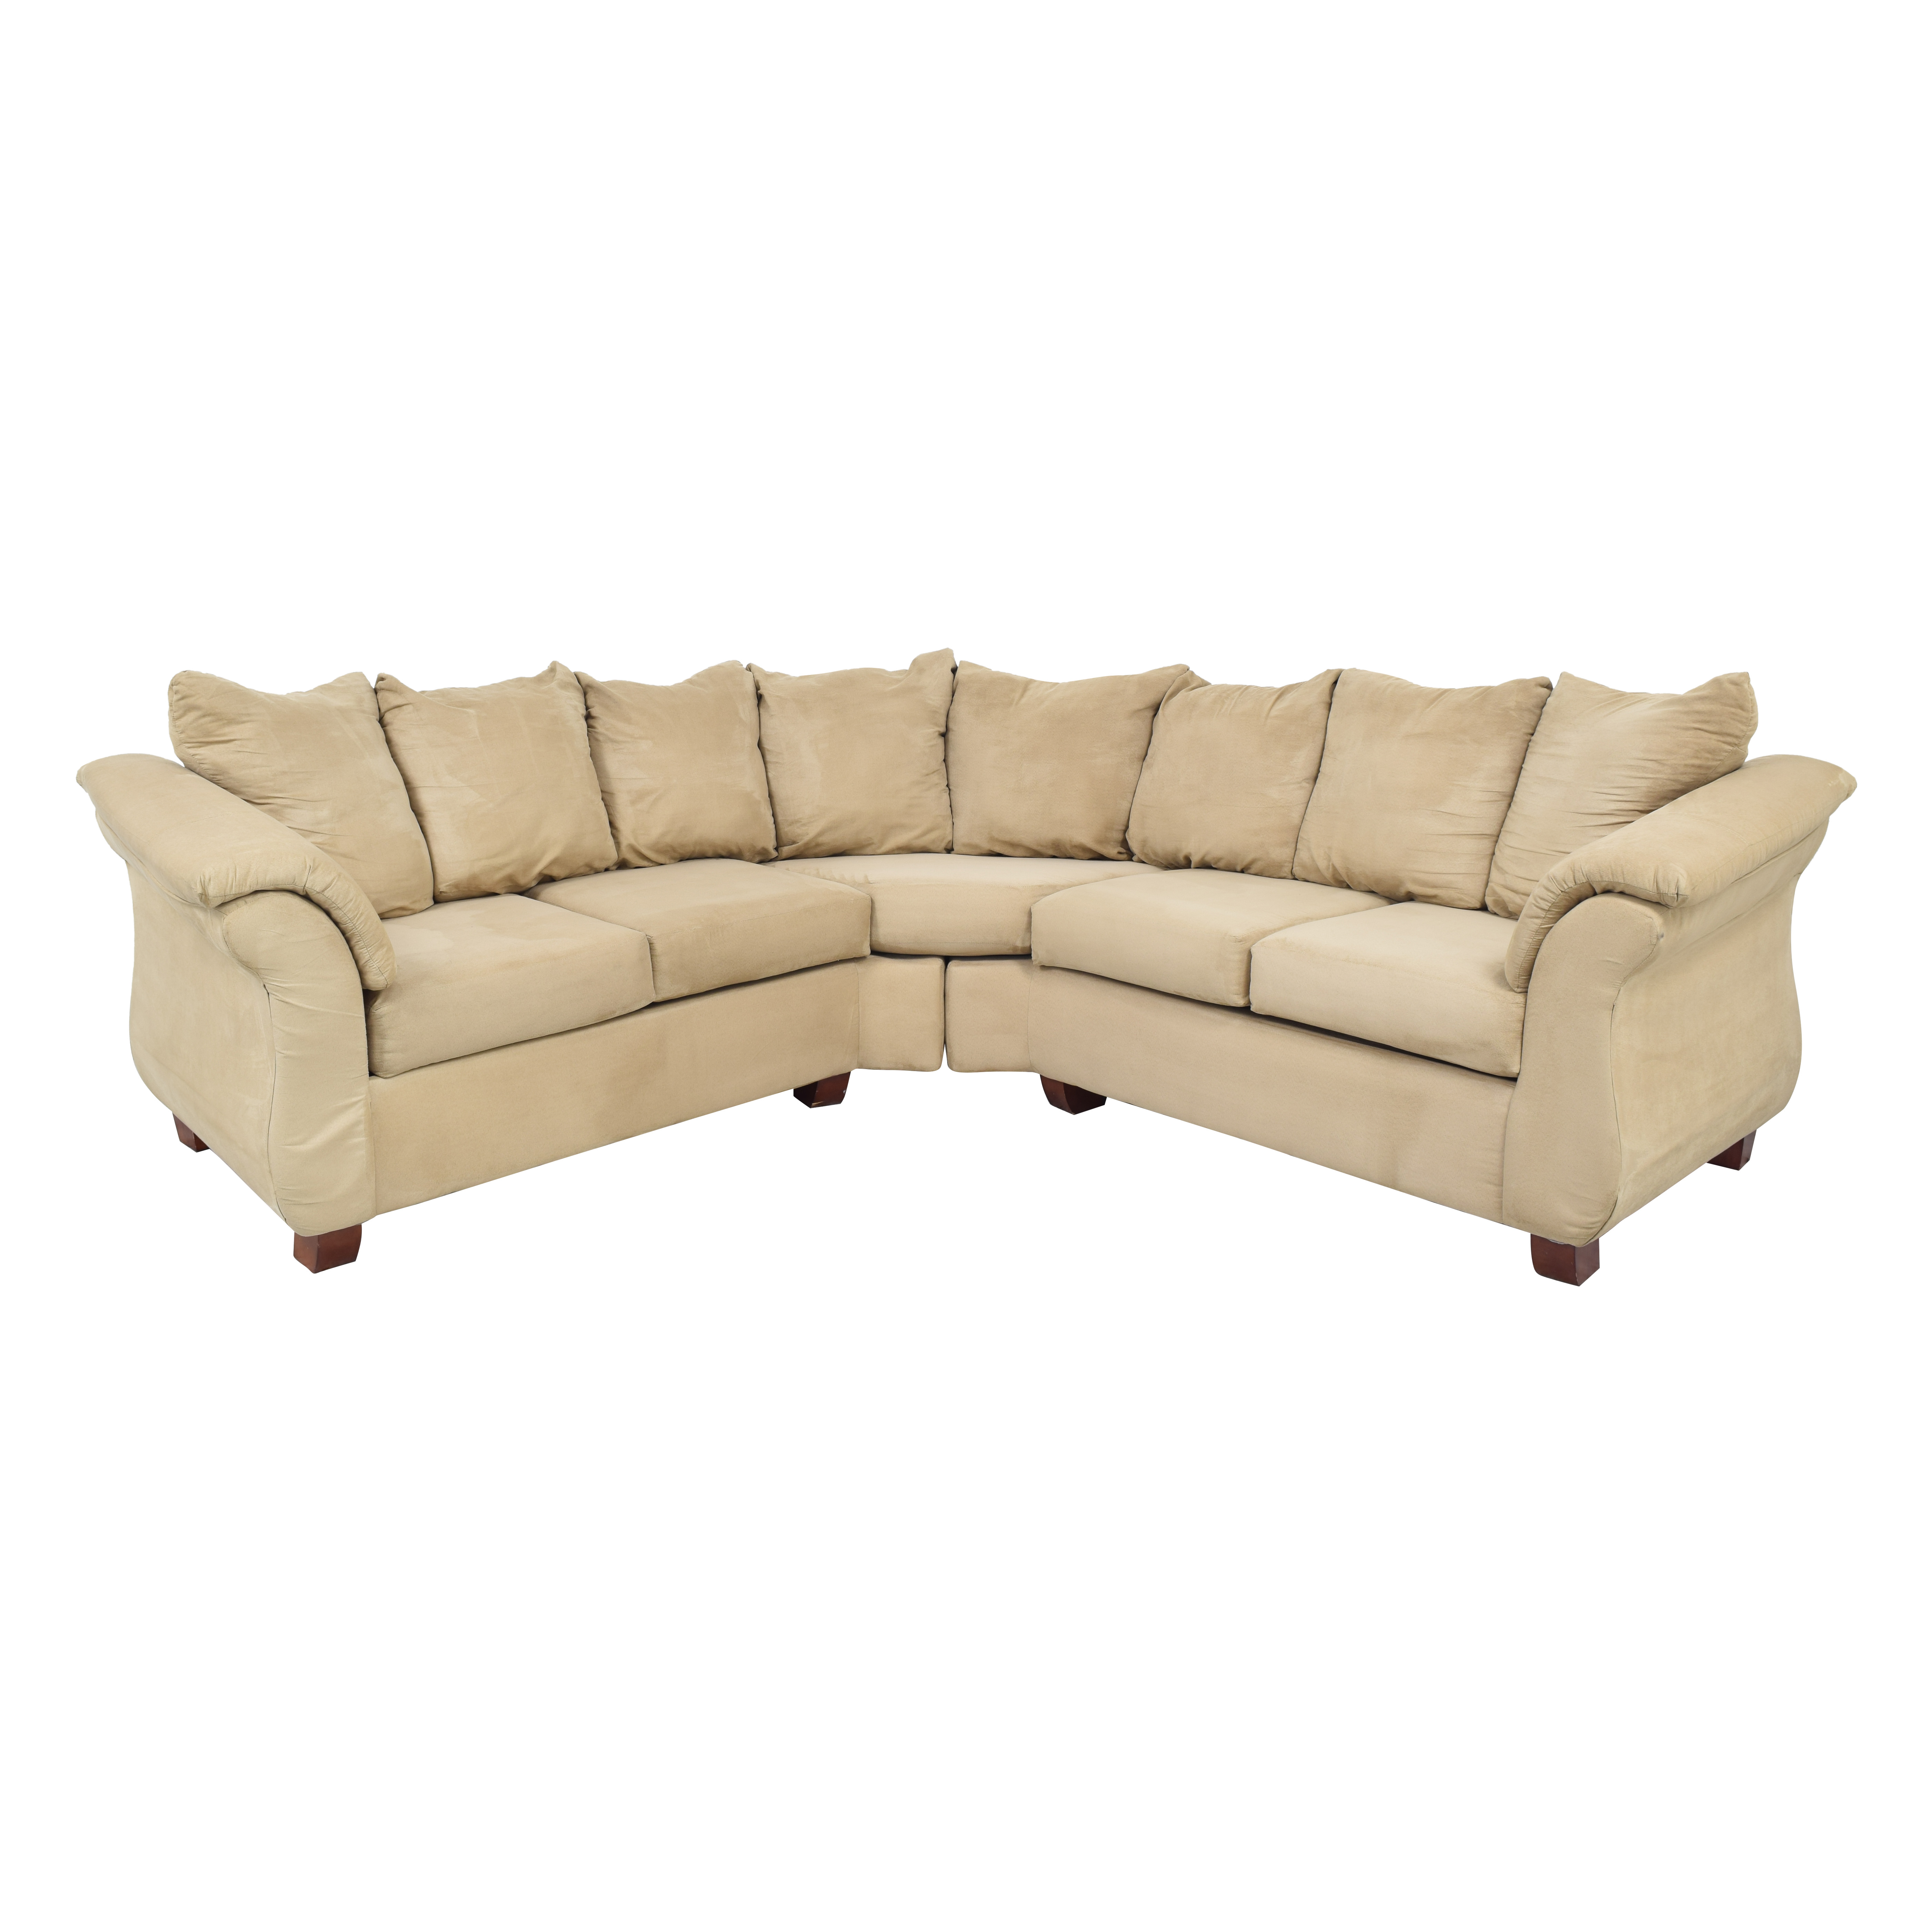 Washington Furniture Washington Furniture Sectional Sofa ct